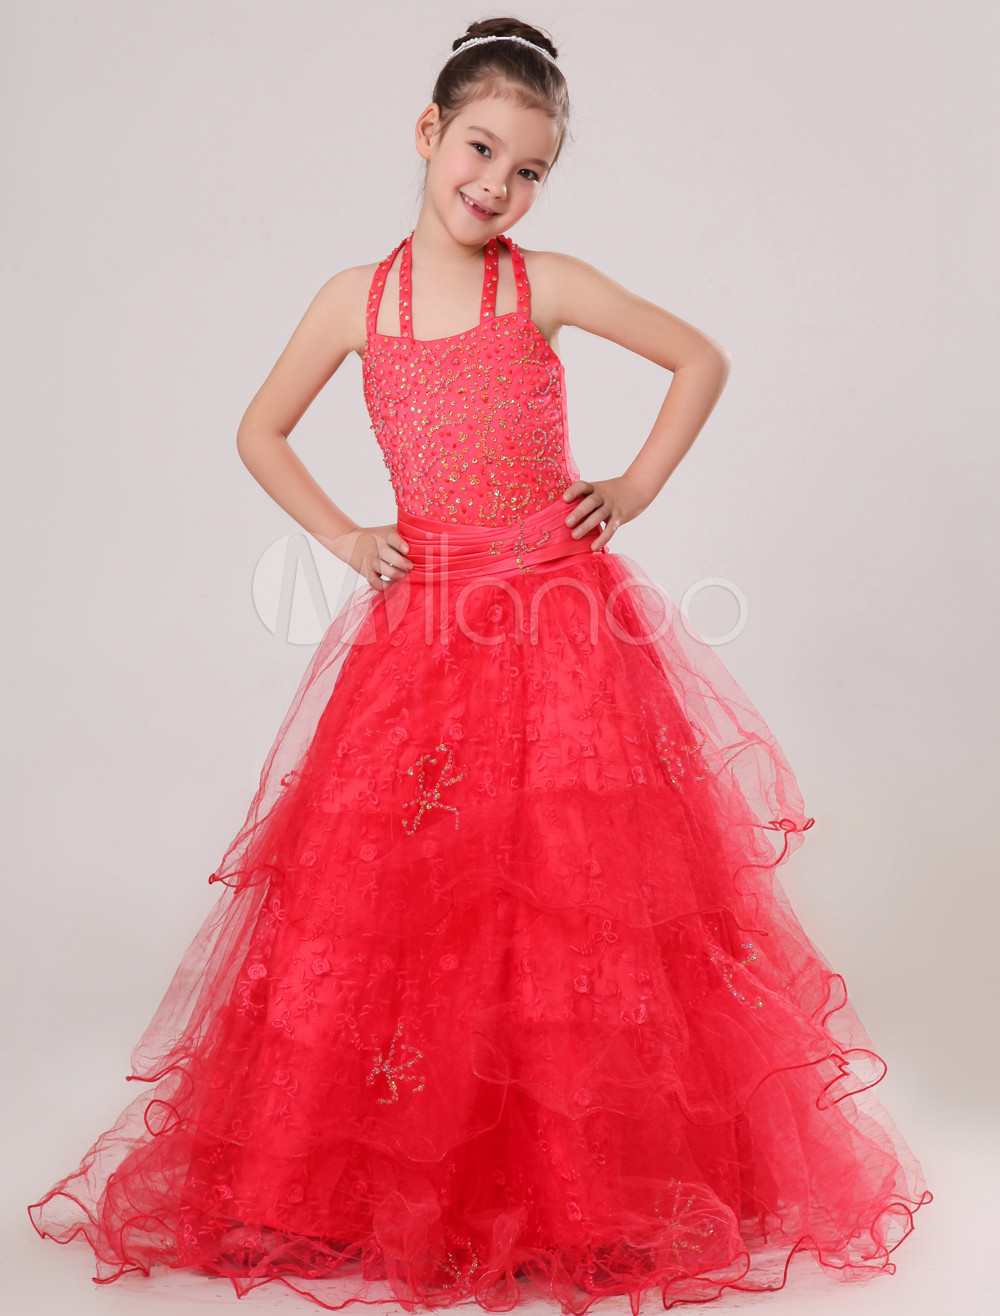 Red Halter Floor-Length Ruffles Ball Gown Girls Pageant Dress (Wedding Flower Girl Dresses) photo